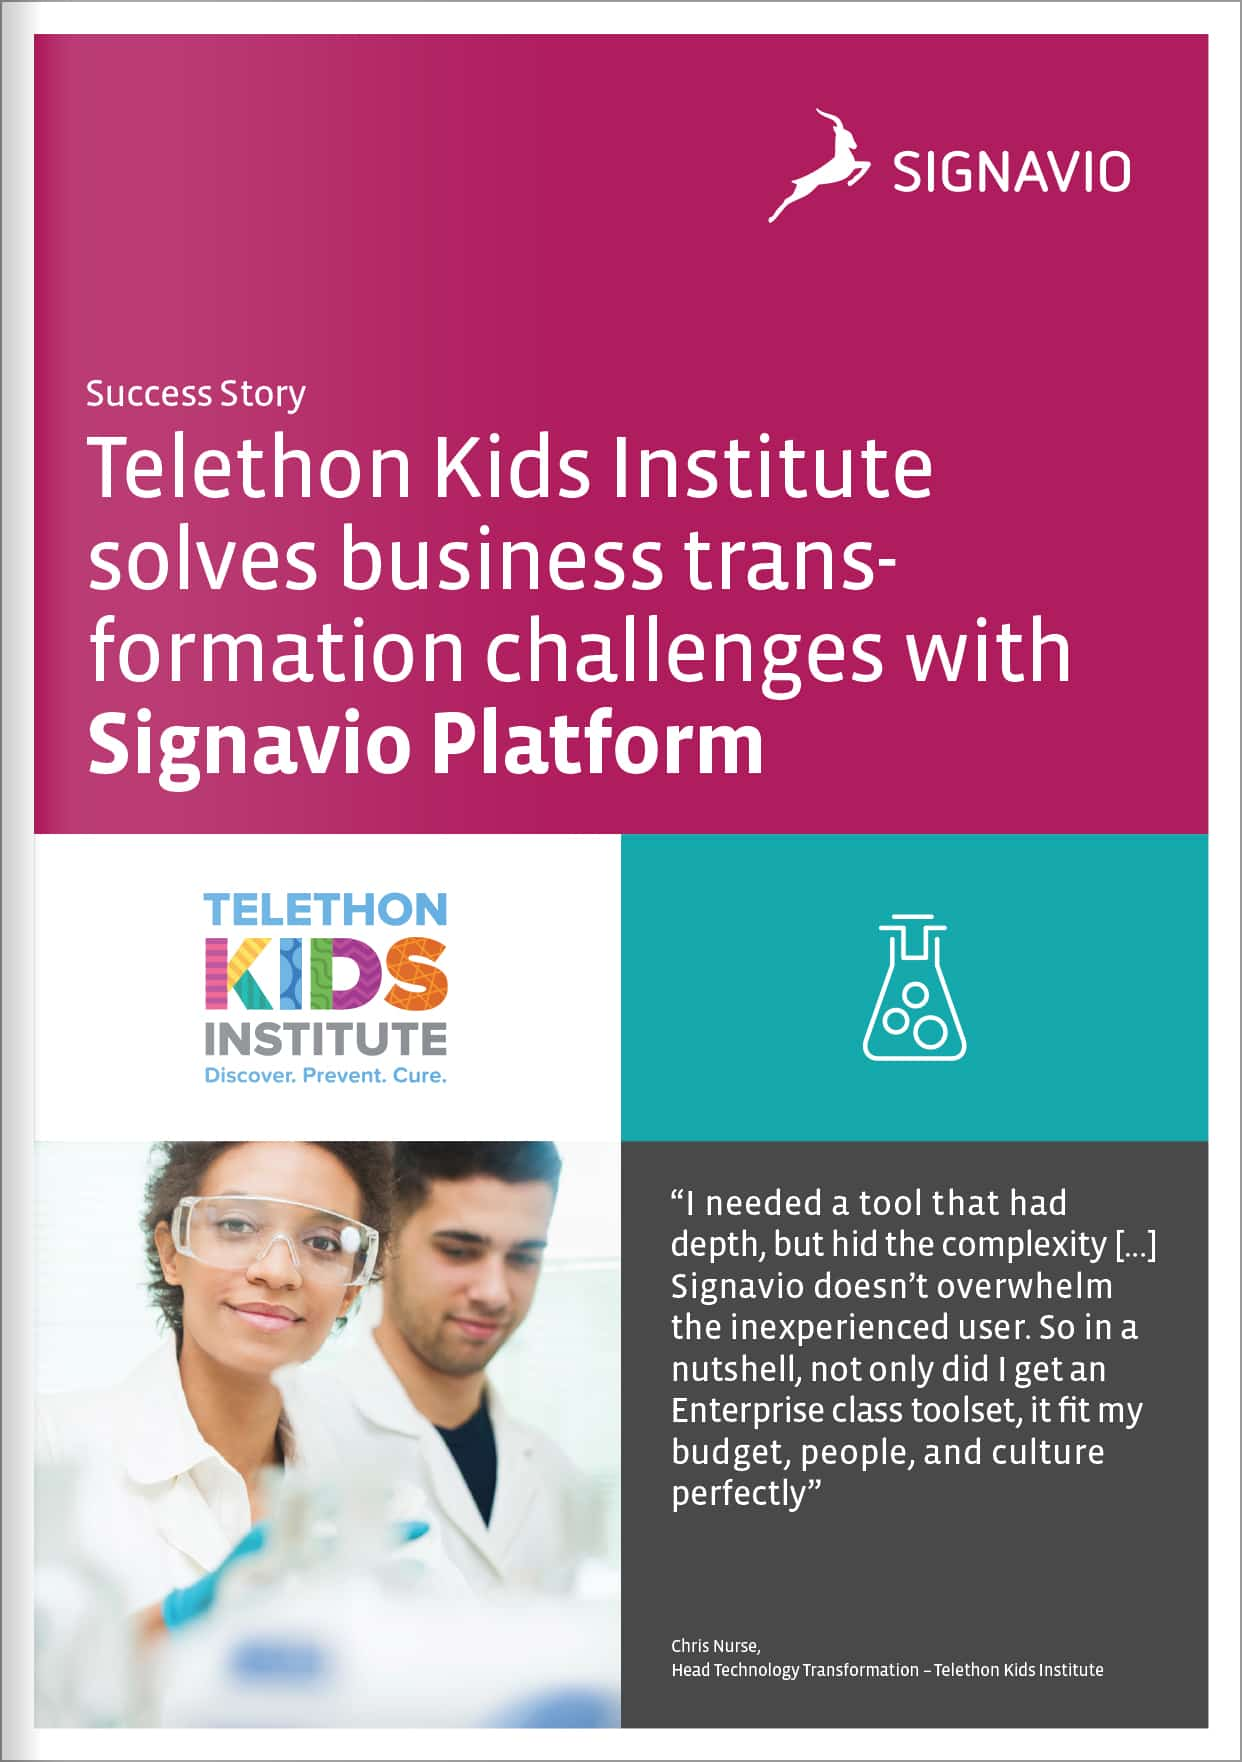 Telethon Kids Institute solves business transformation challenges with Signavio Platform